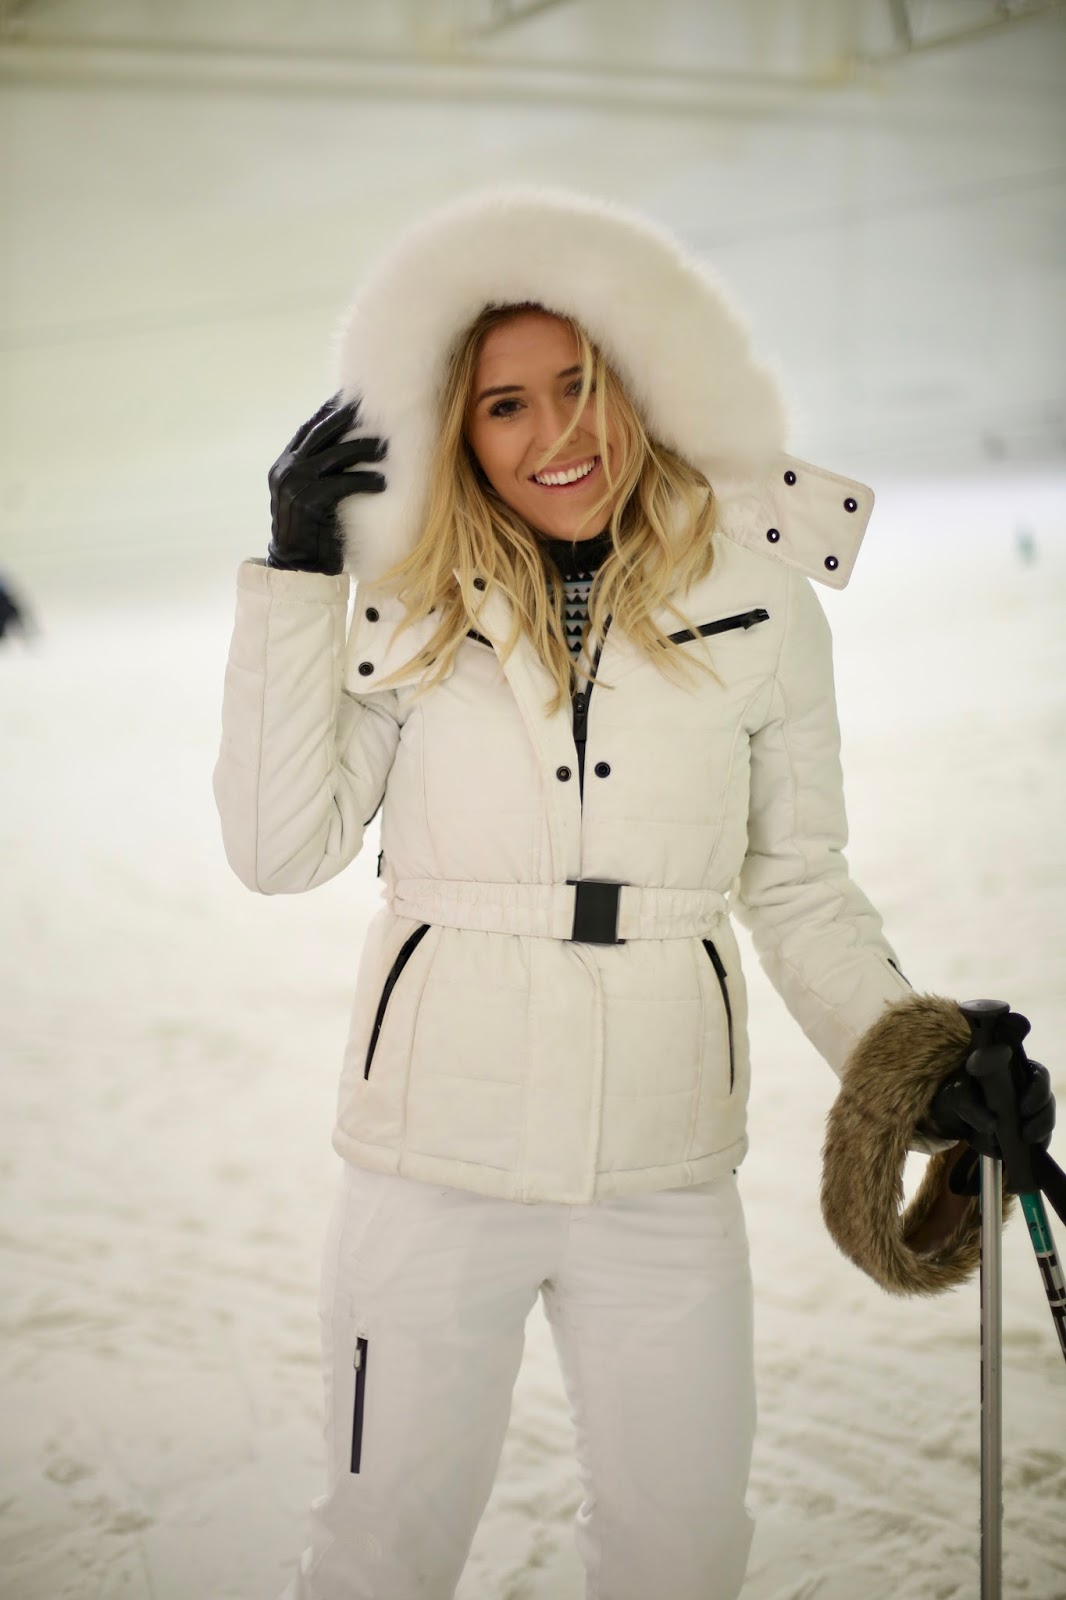 topshop ski kit